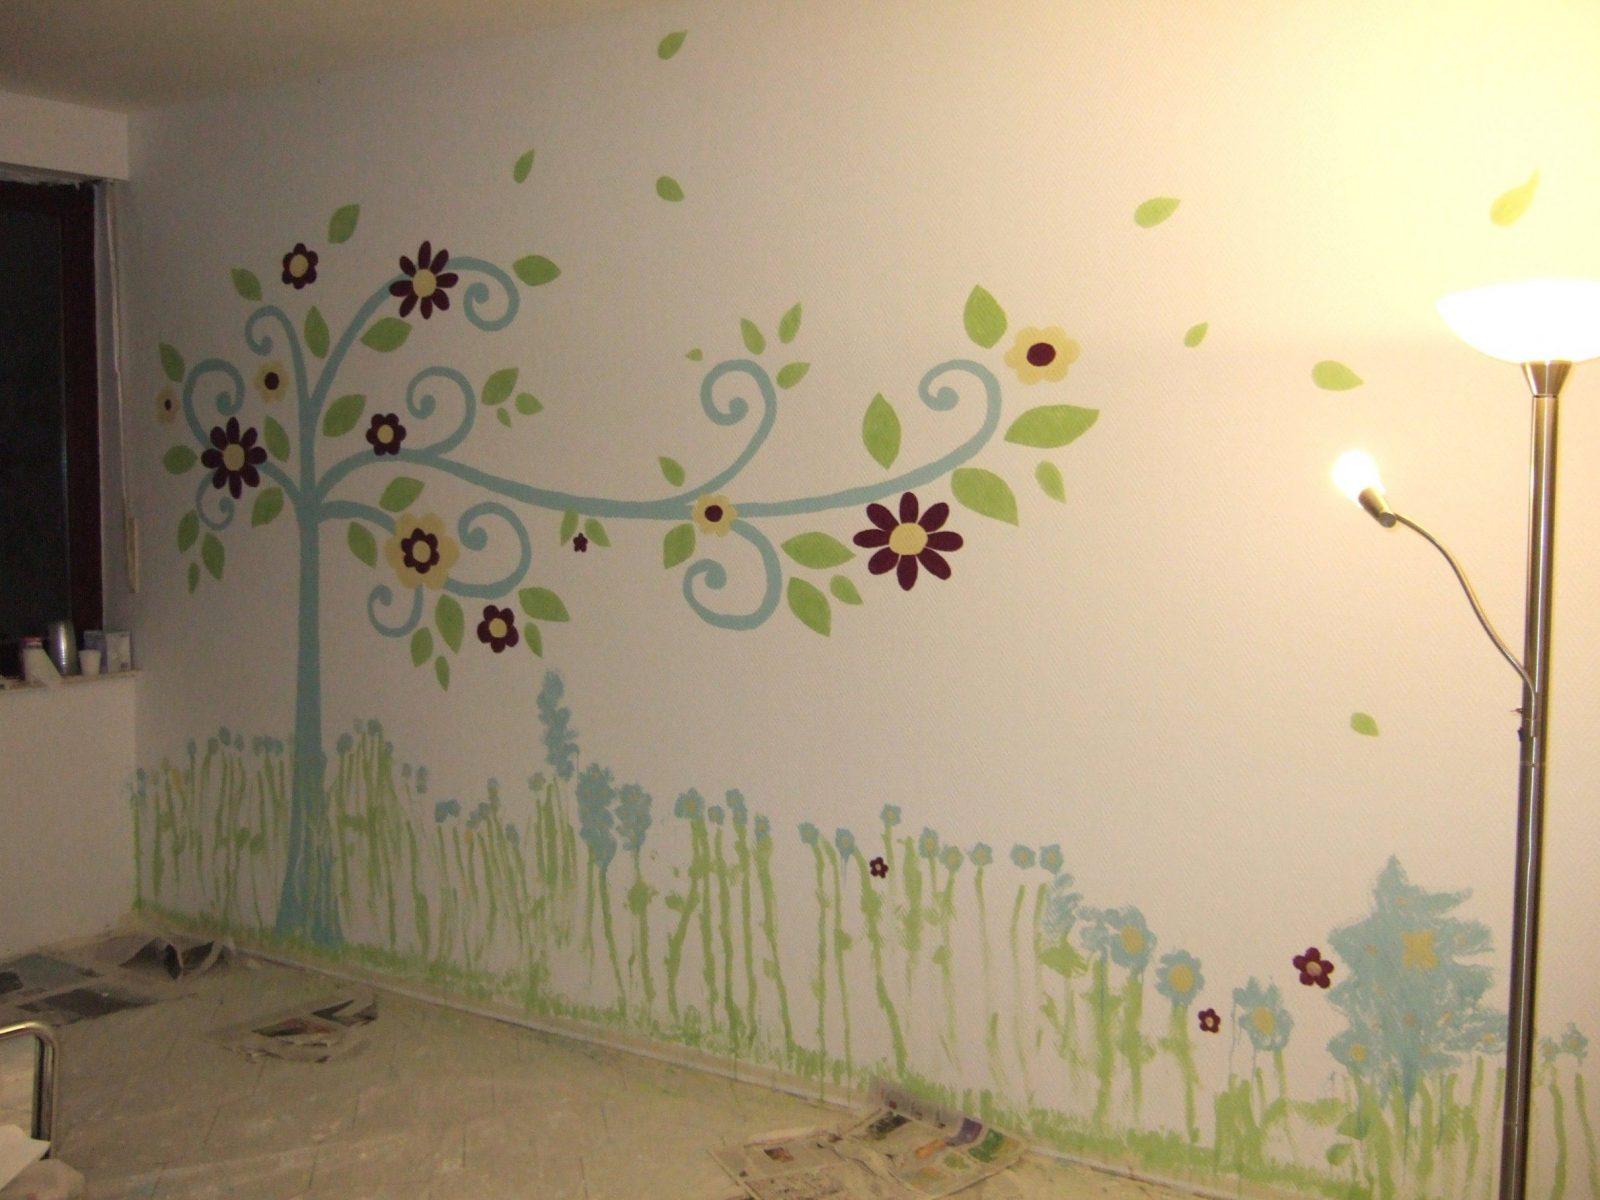 Herausragende Inspiration Wandbilder Selber Malen Vorlagen Und von Wandbilder Selber Malen Vorlagen Bild